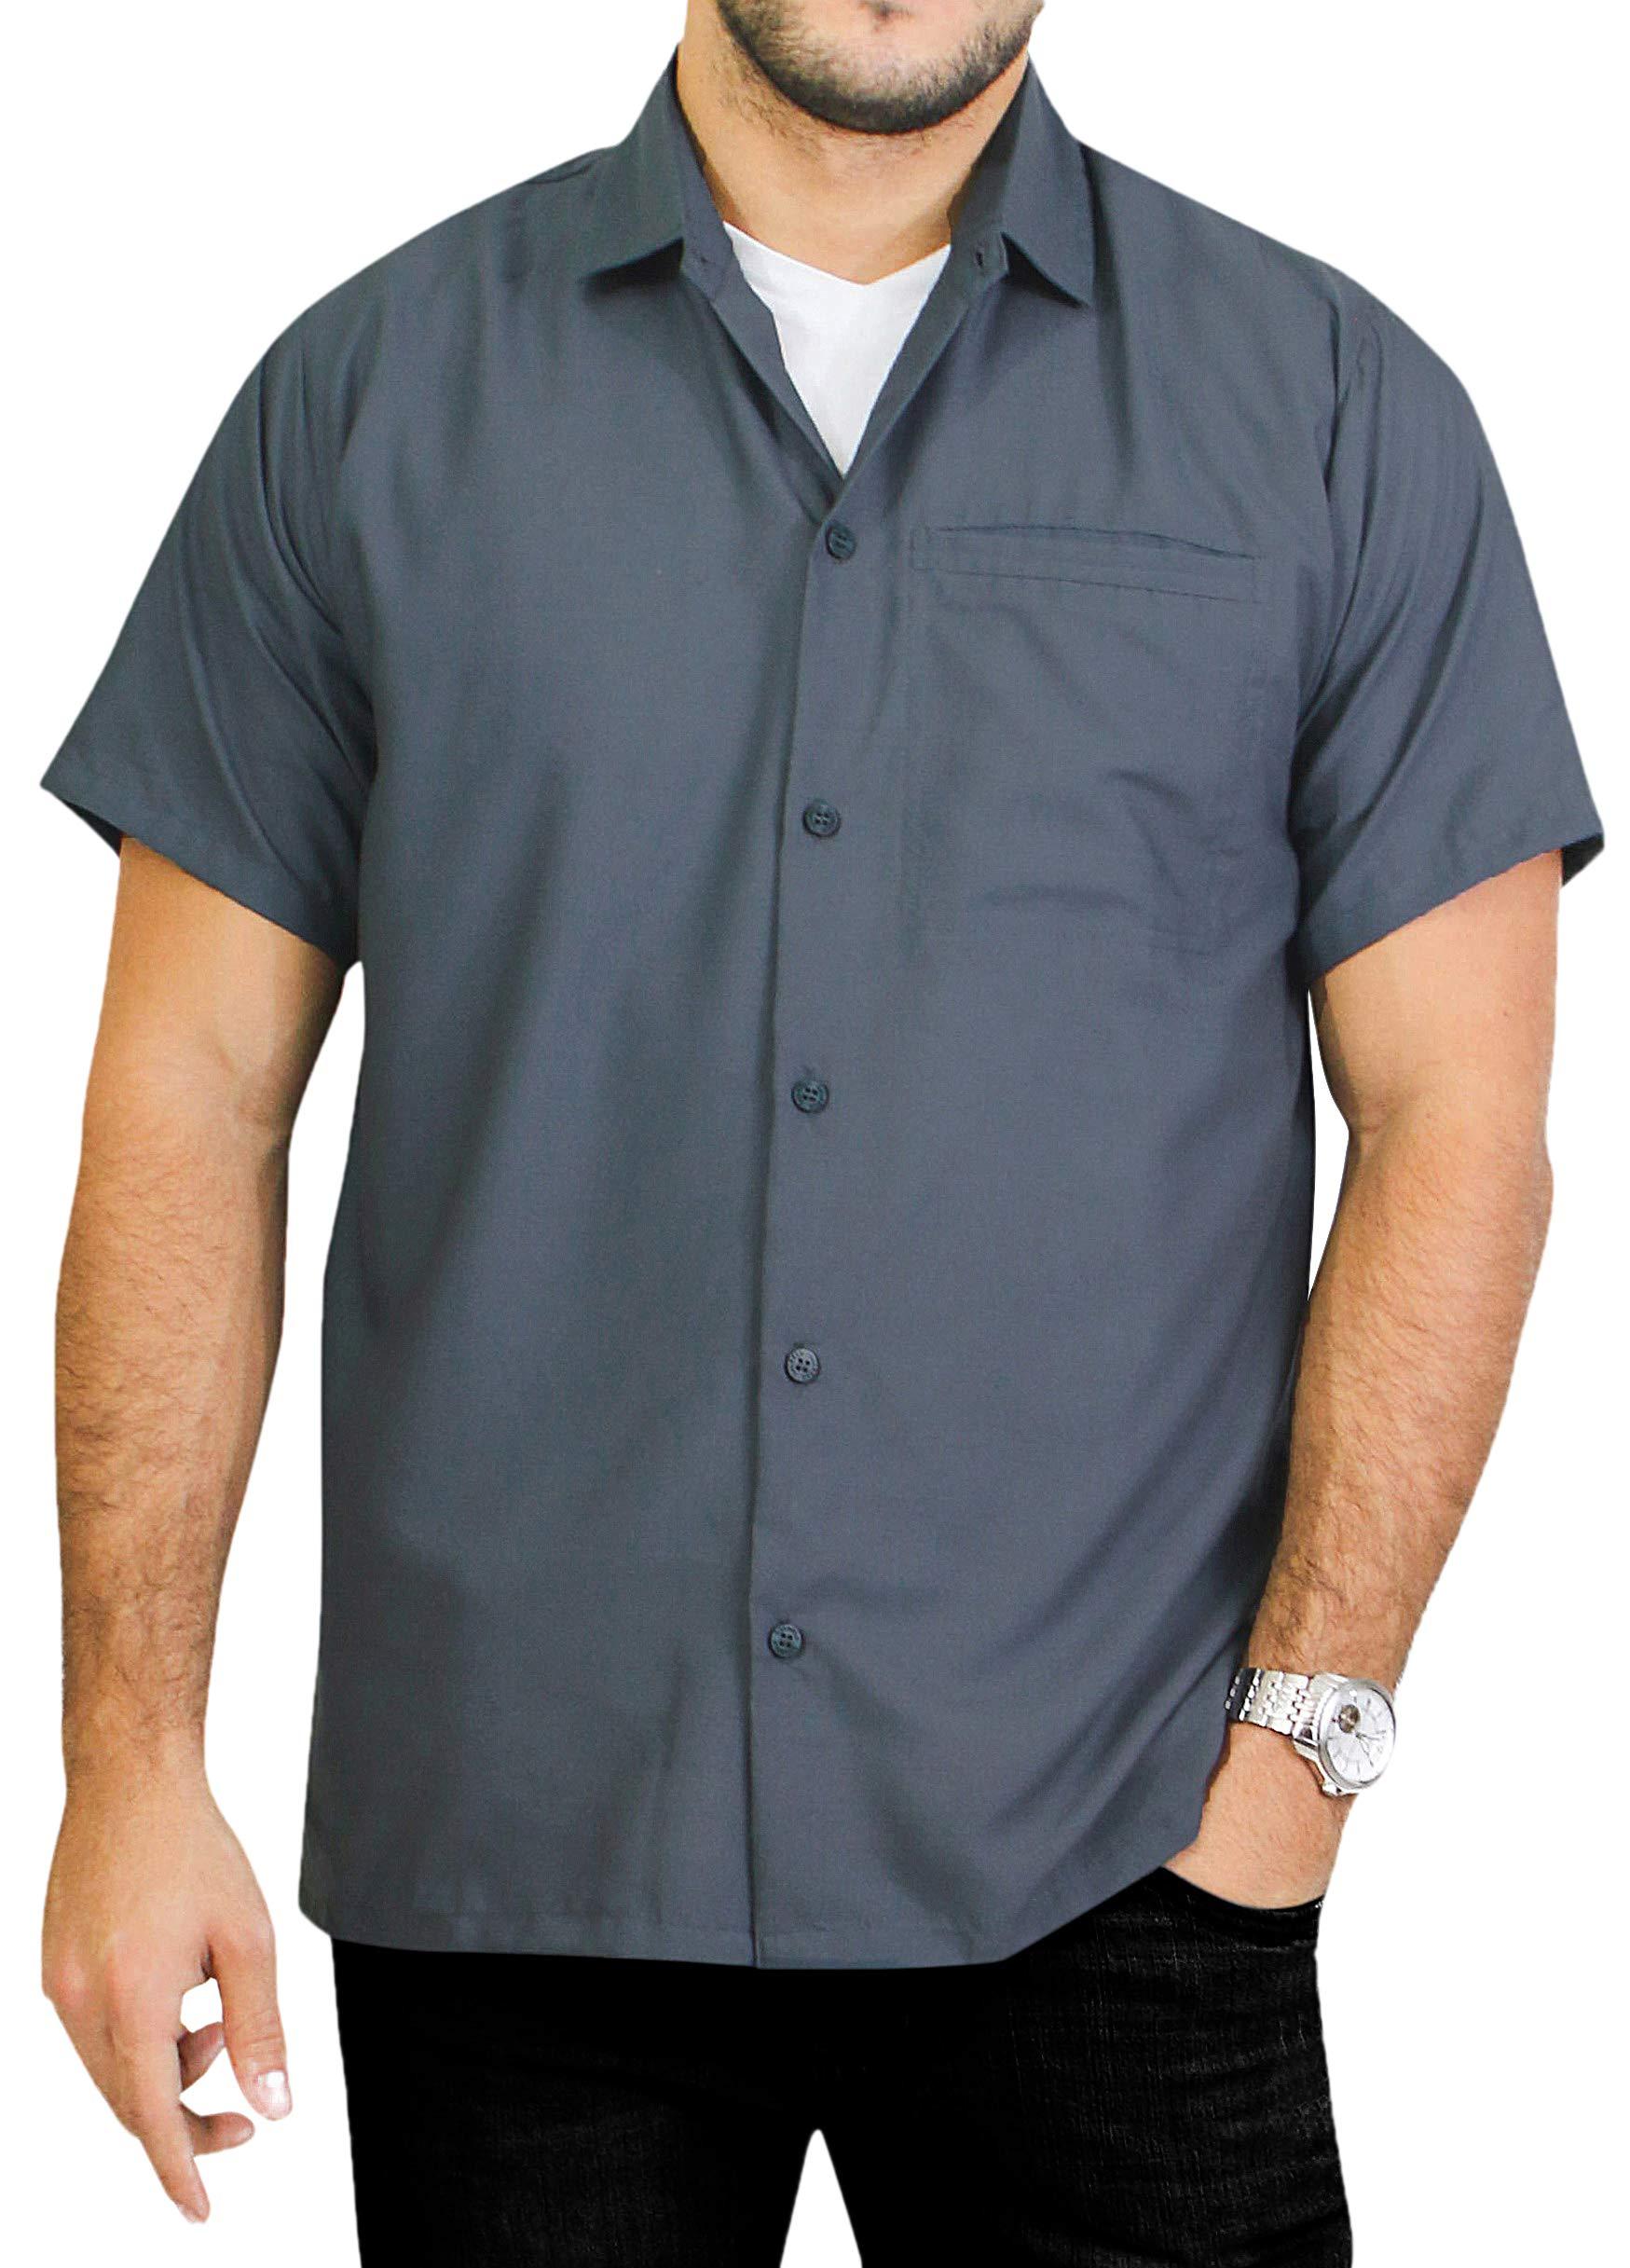 LA LEELA Rayon Casual Solid Plain Camp Shirt Grey 6XL   Chest 68'' -70''